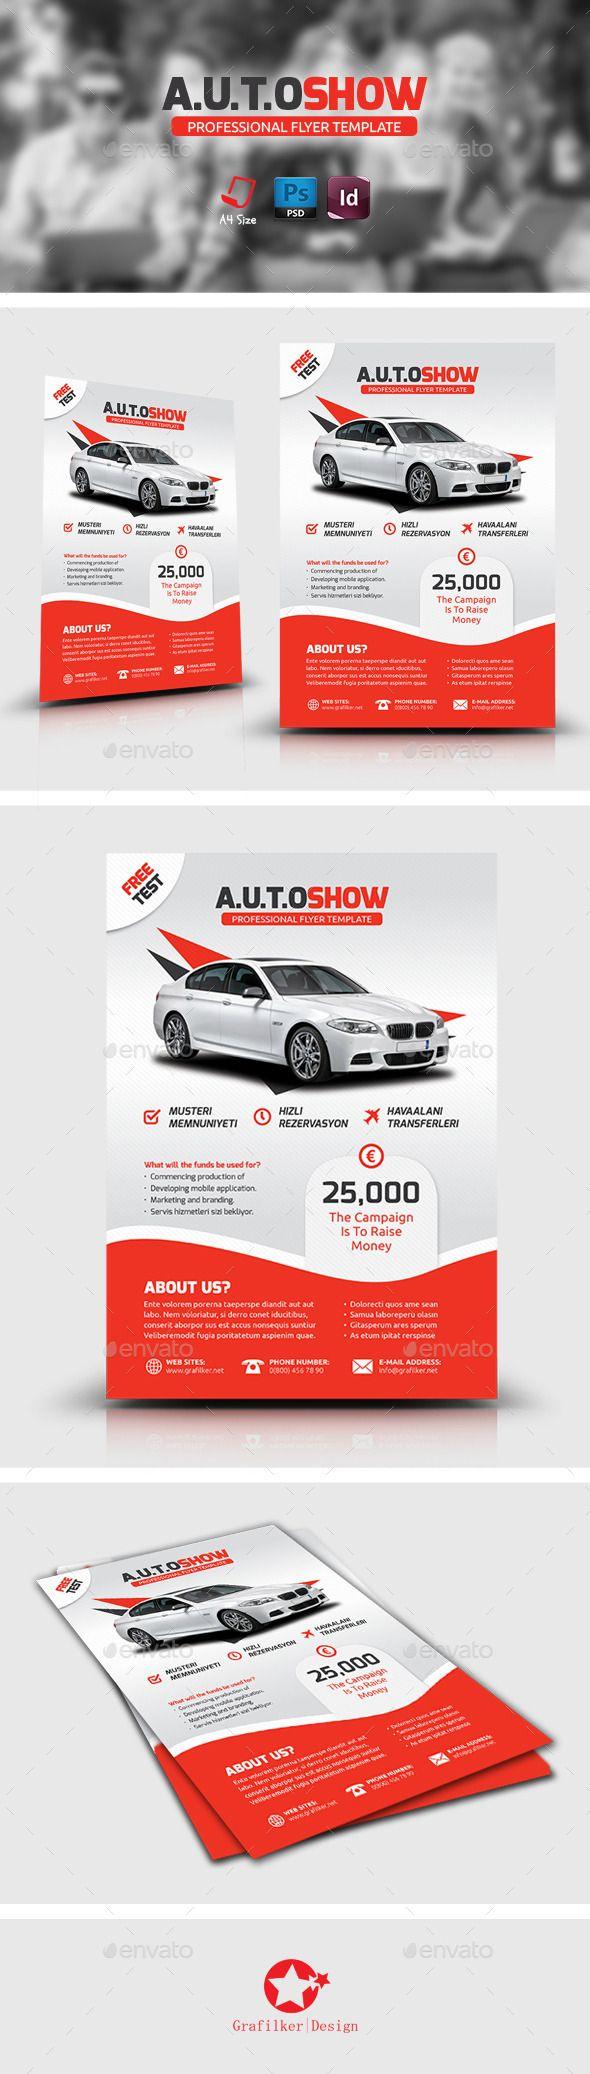 Charmant Auto Show Flyer Vorlagen Fotos - Entry Level Resume ...